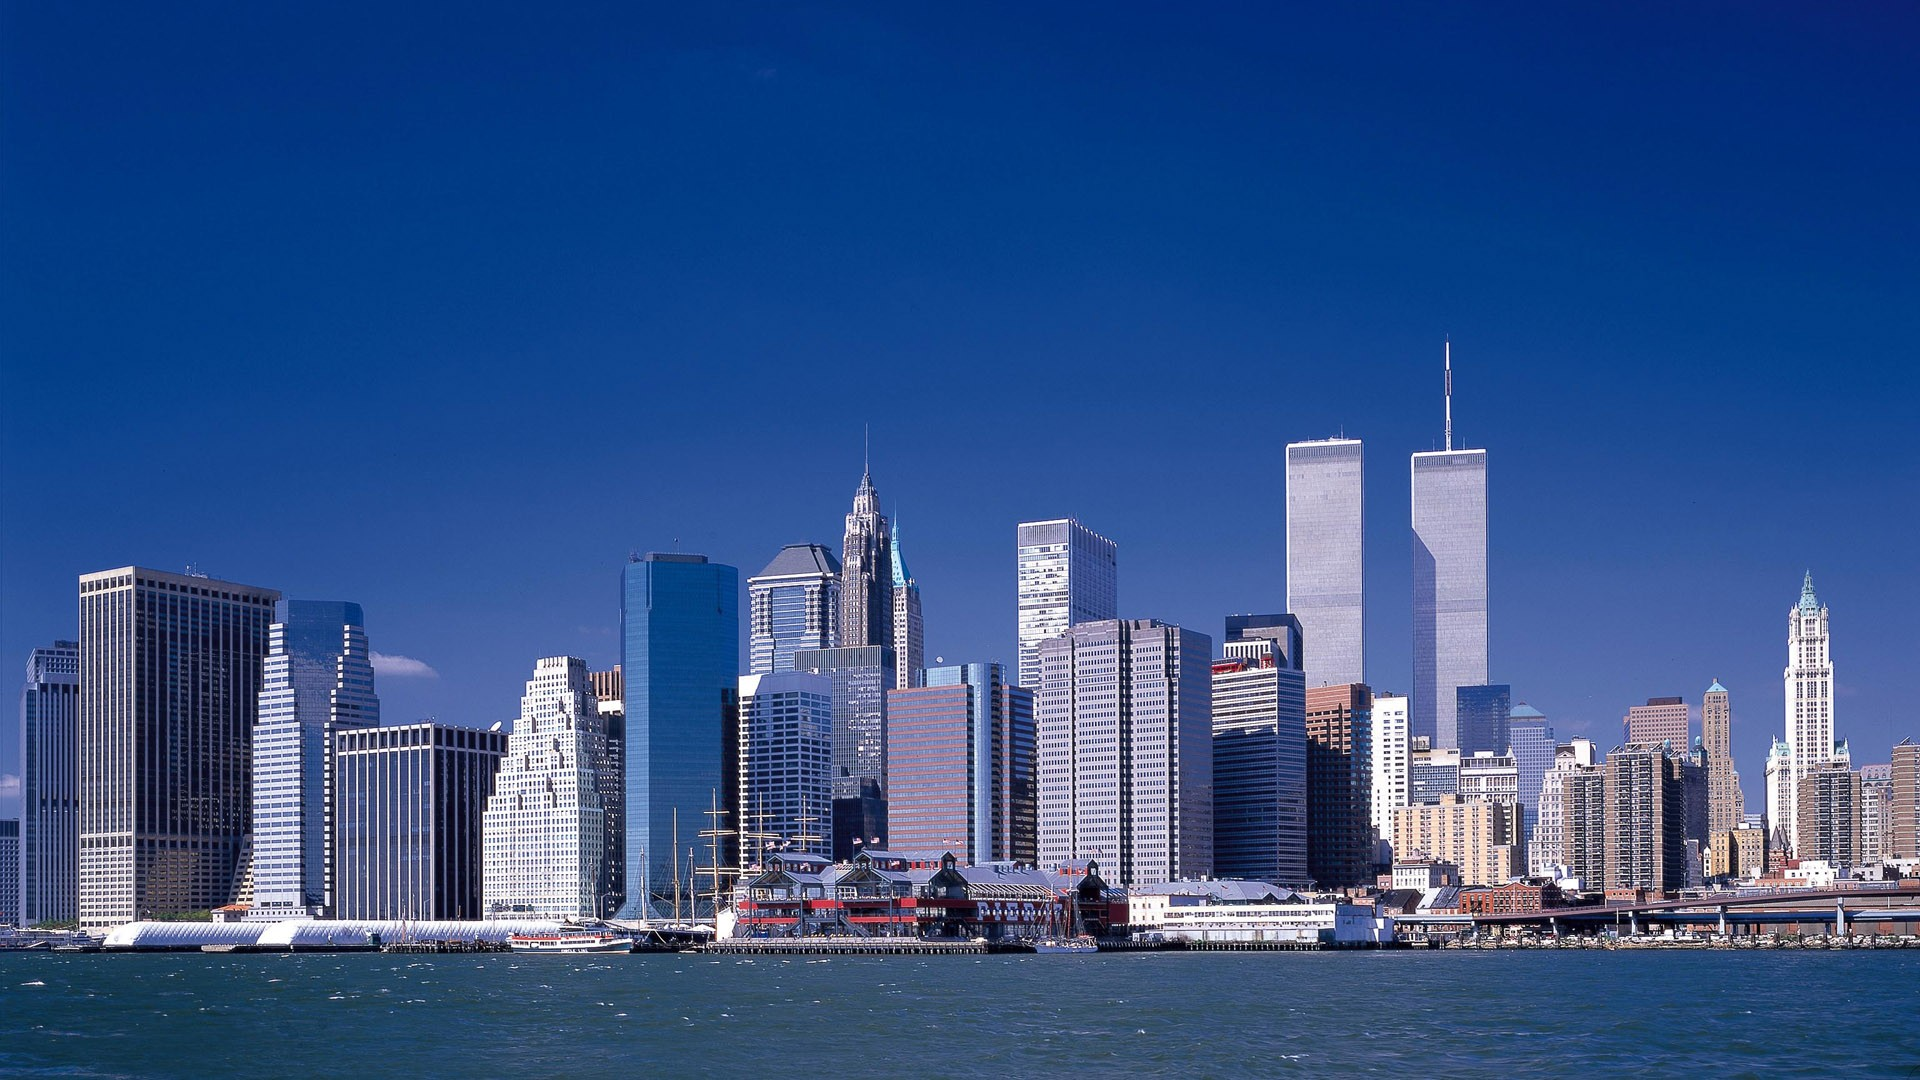 New york buildings wallpaper Wallpaper Wide HD 1920x1080